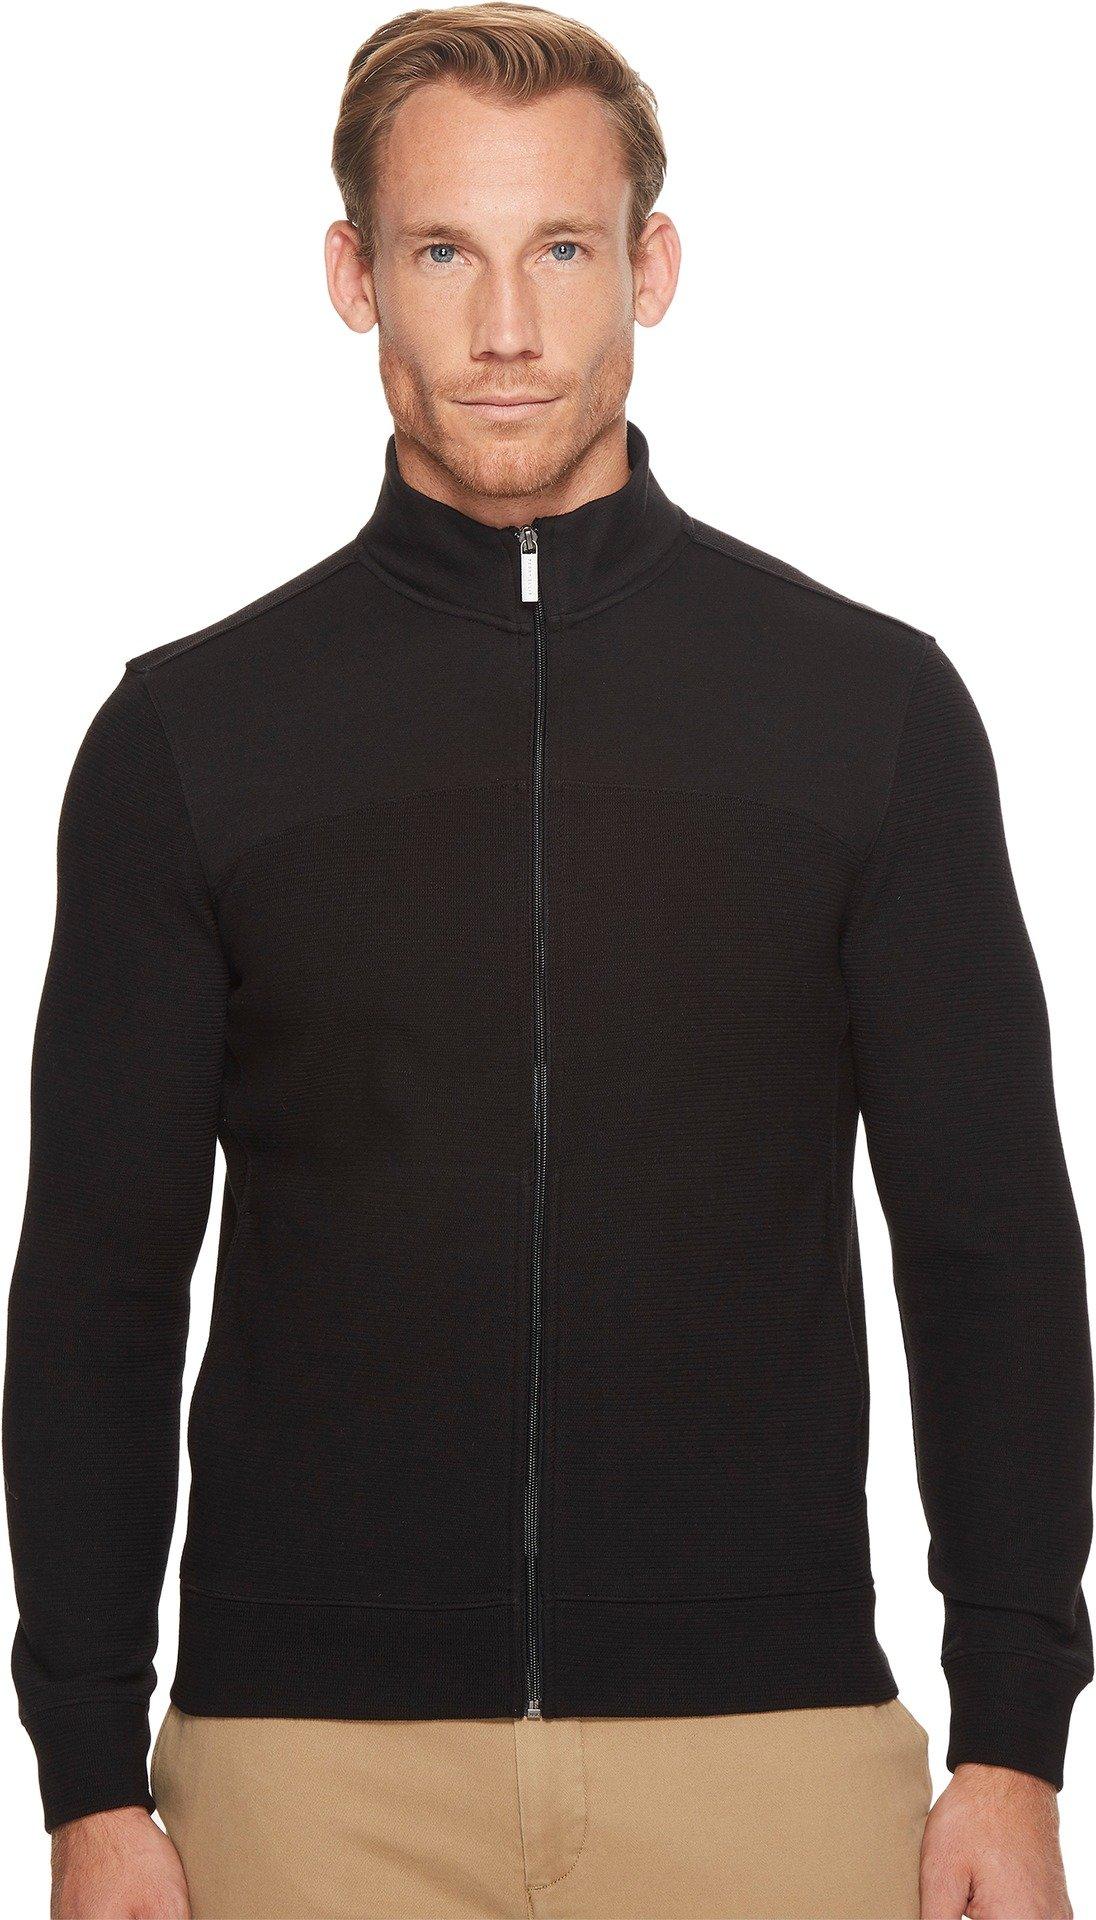 Perry Ellis Men's Cotton Blend Full Zip Texture Knit Jacket, Black-4CHK7101, Extra Large by Perry Ellis